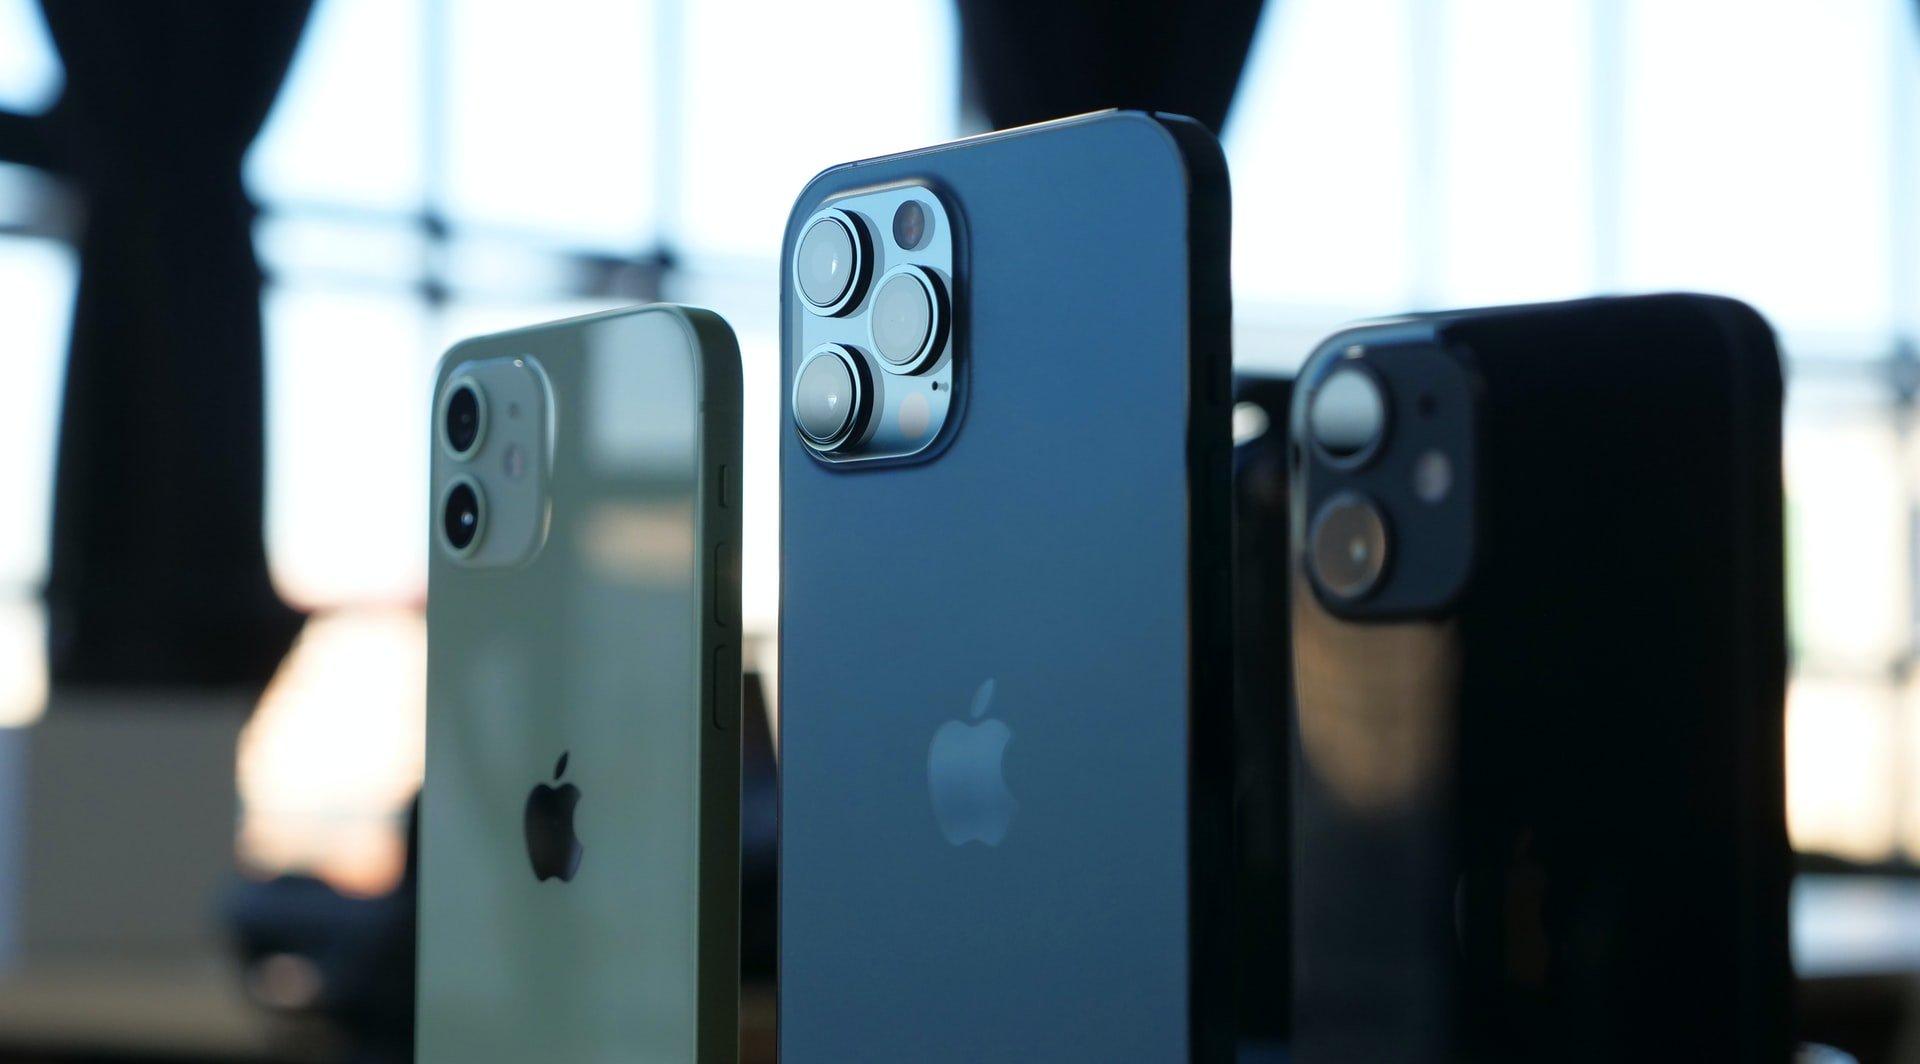 iPhone 13 might get LEO satellite connectivity